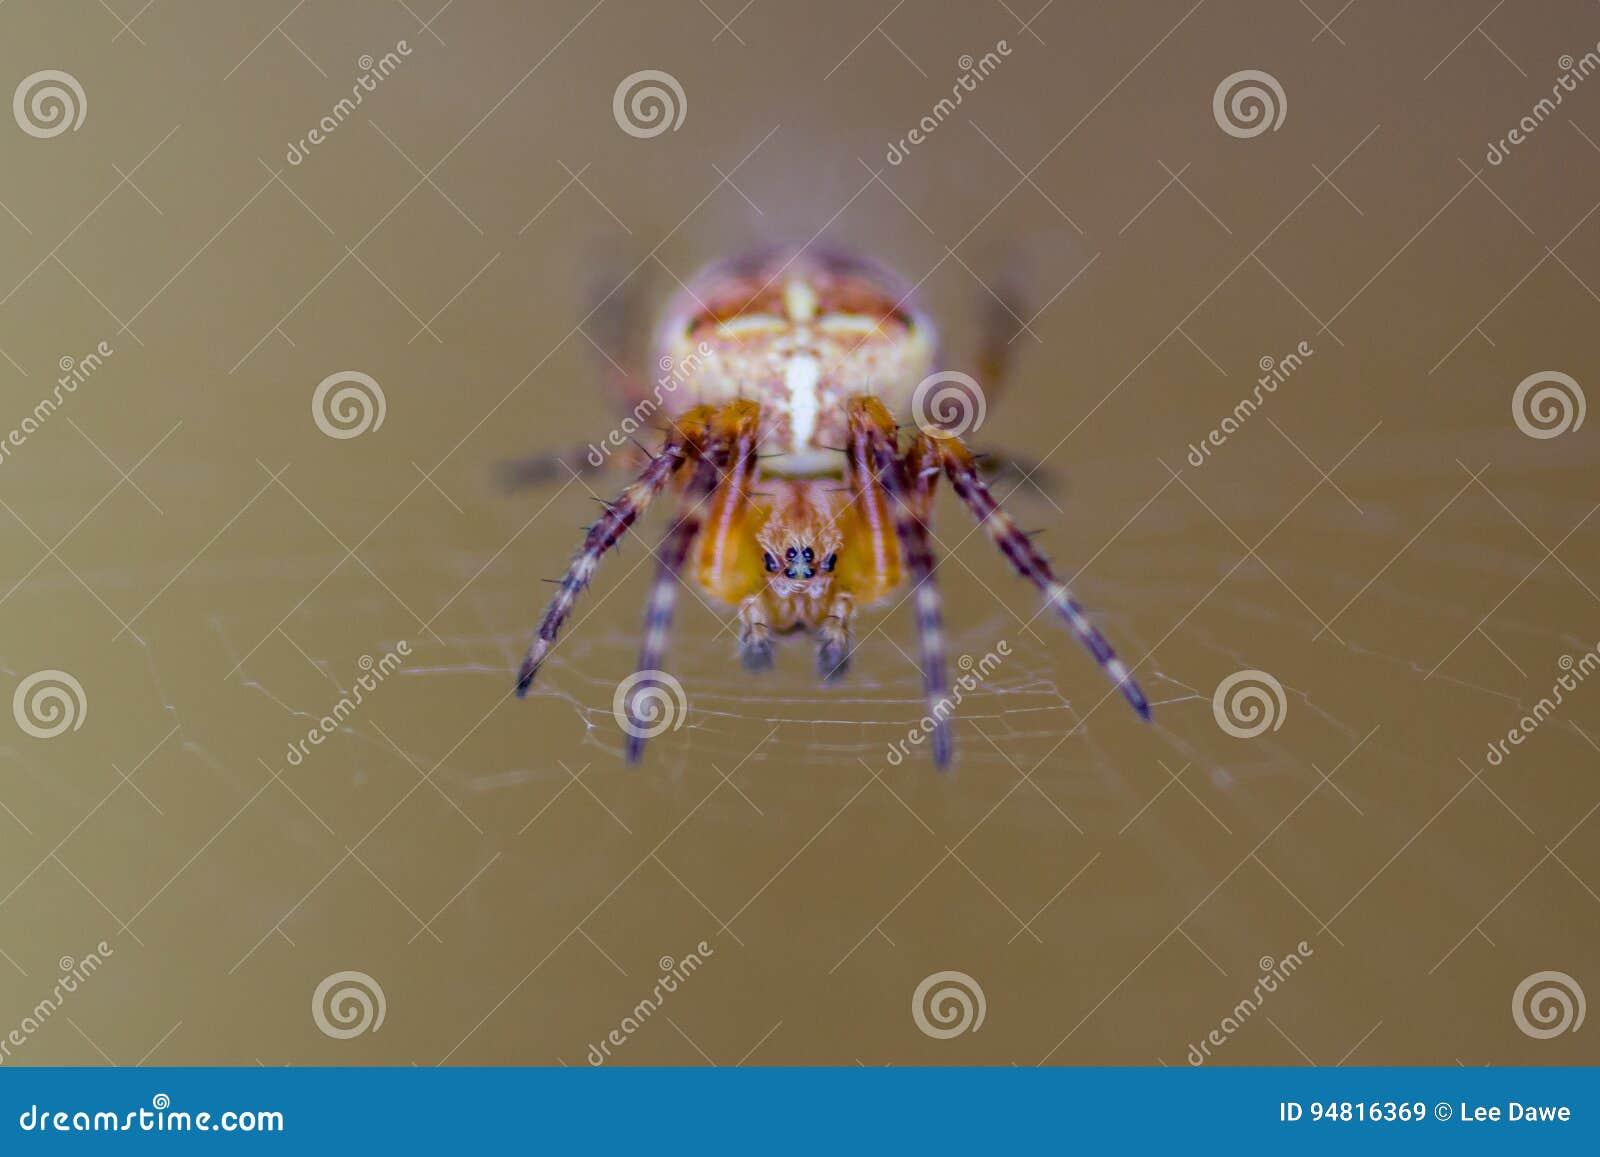 European Garden Spider Or Cross Orb-Weaver Stock Image - Image of ...